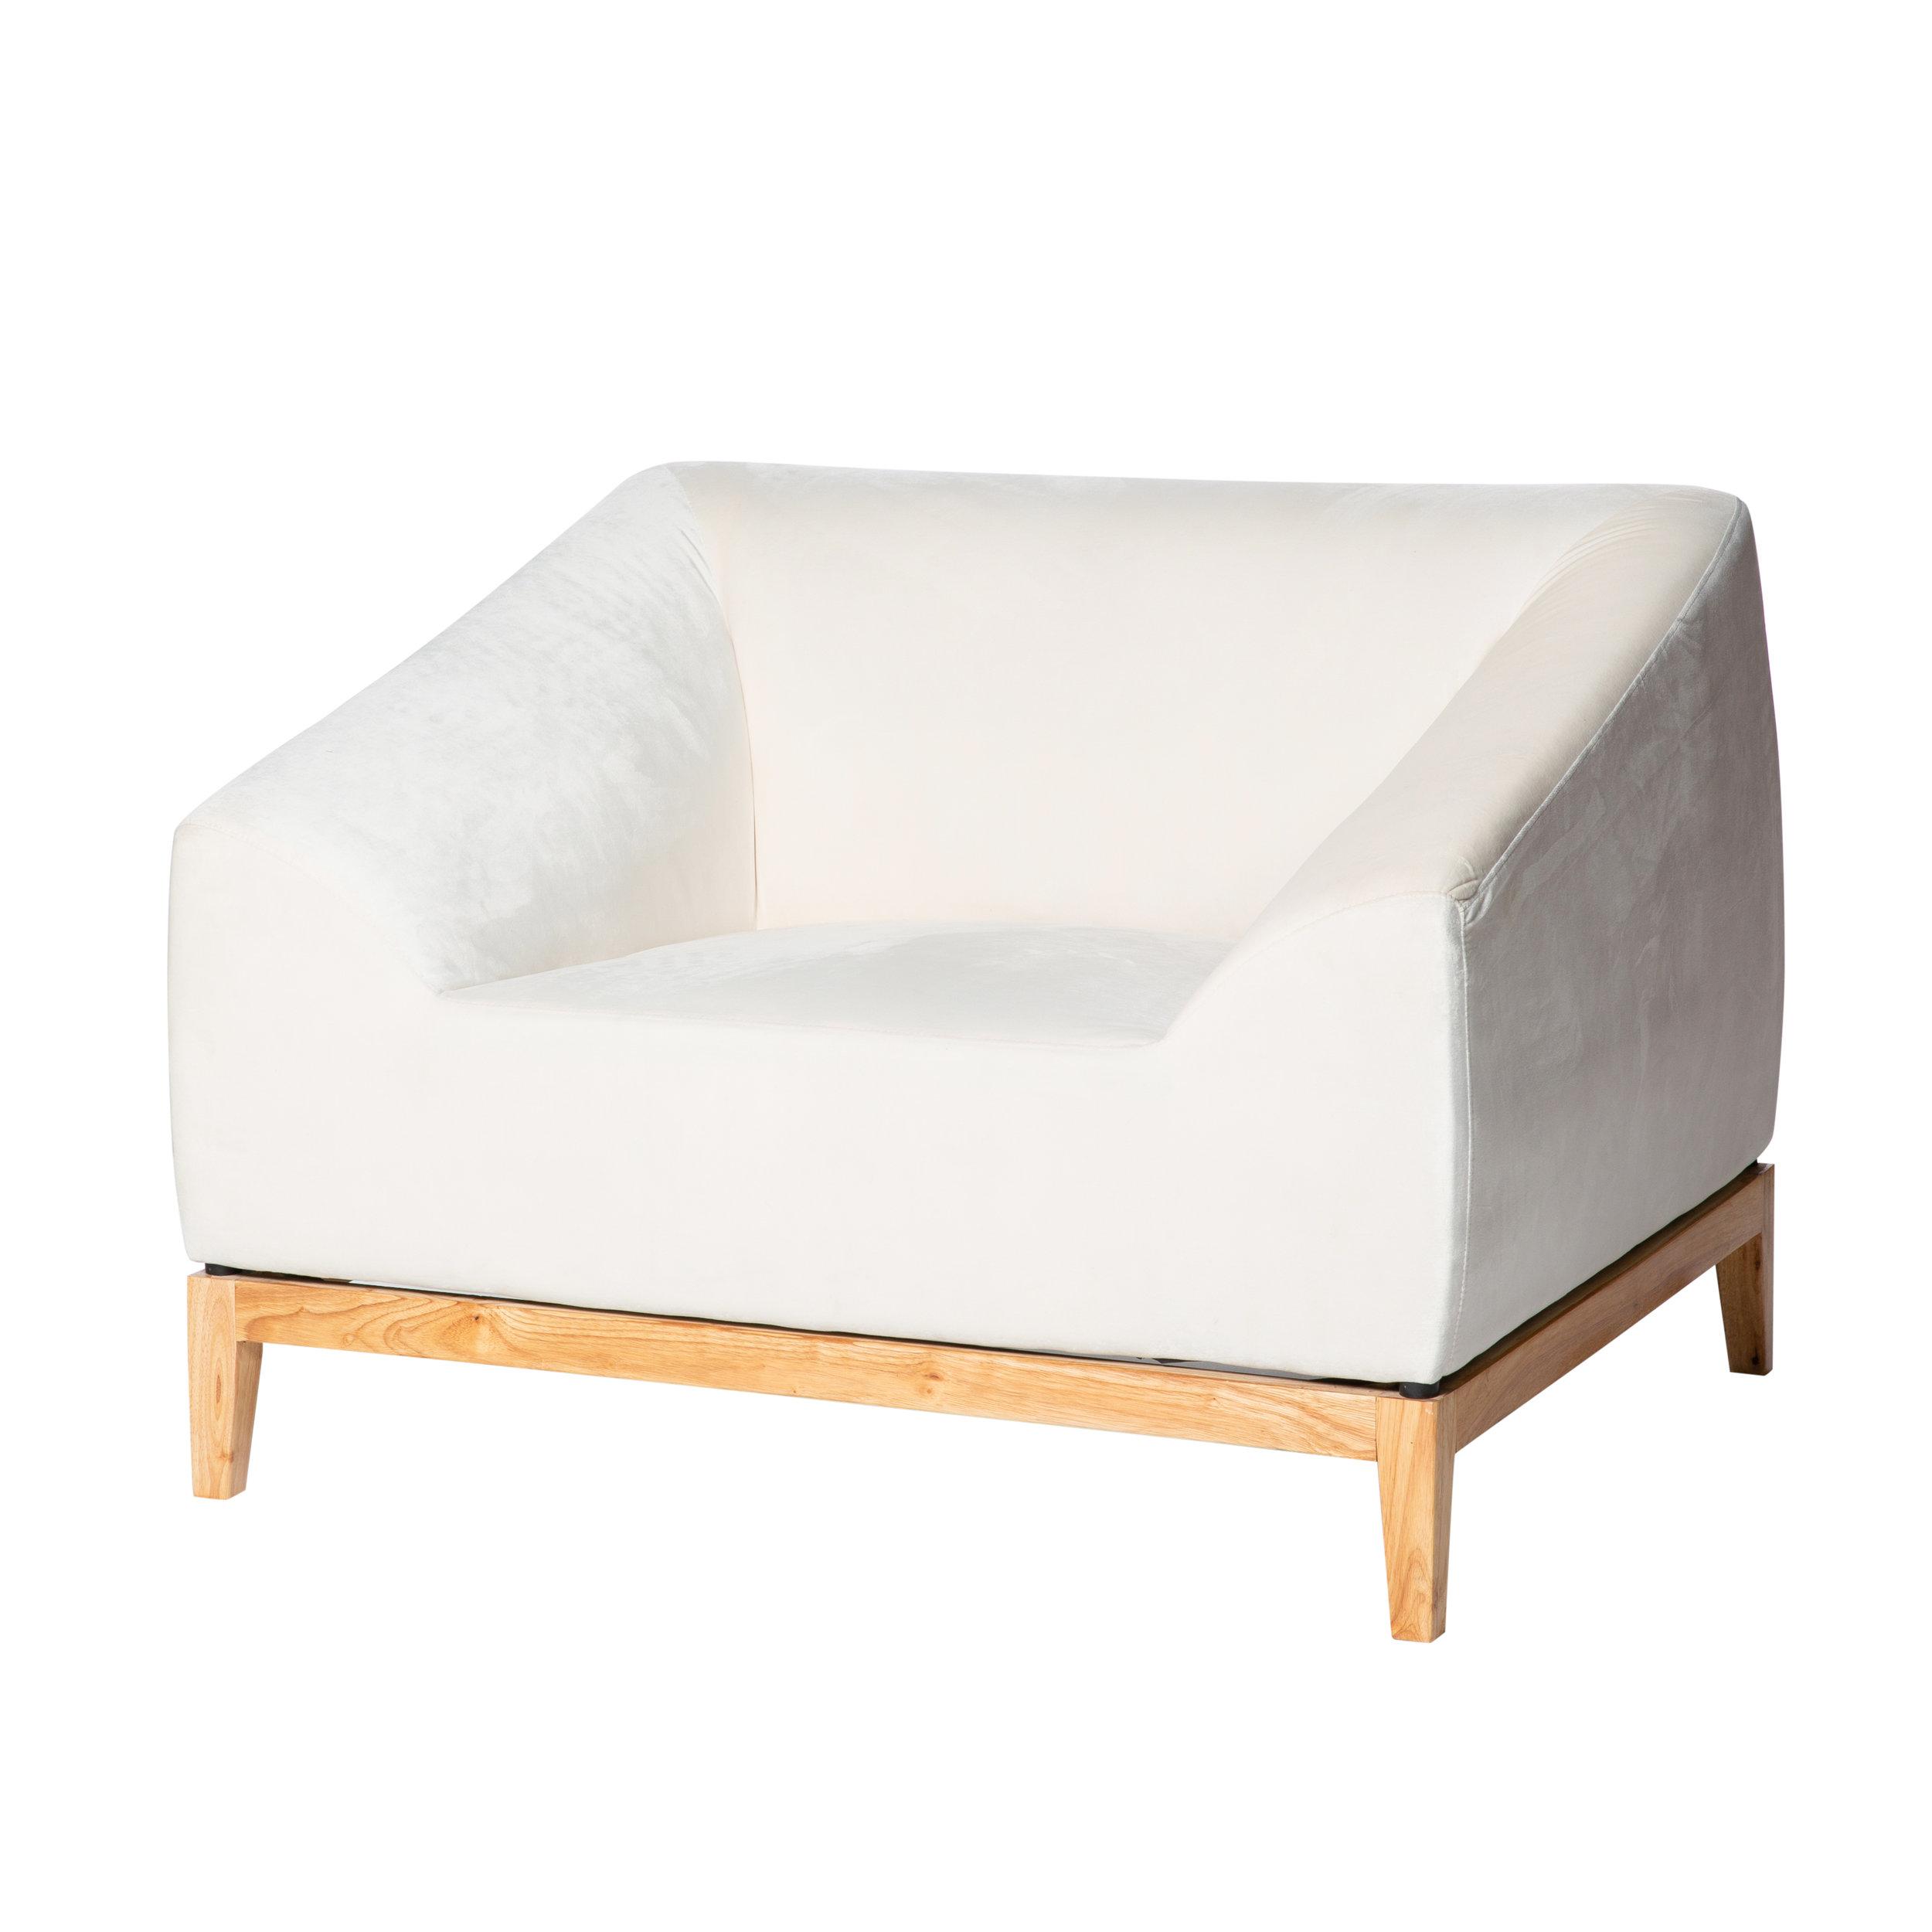 Melrose Club Chair - $250 | QTY: 8